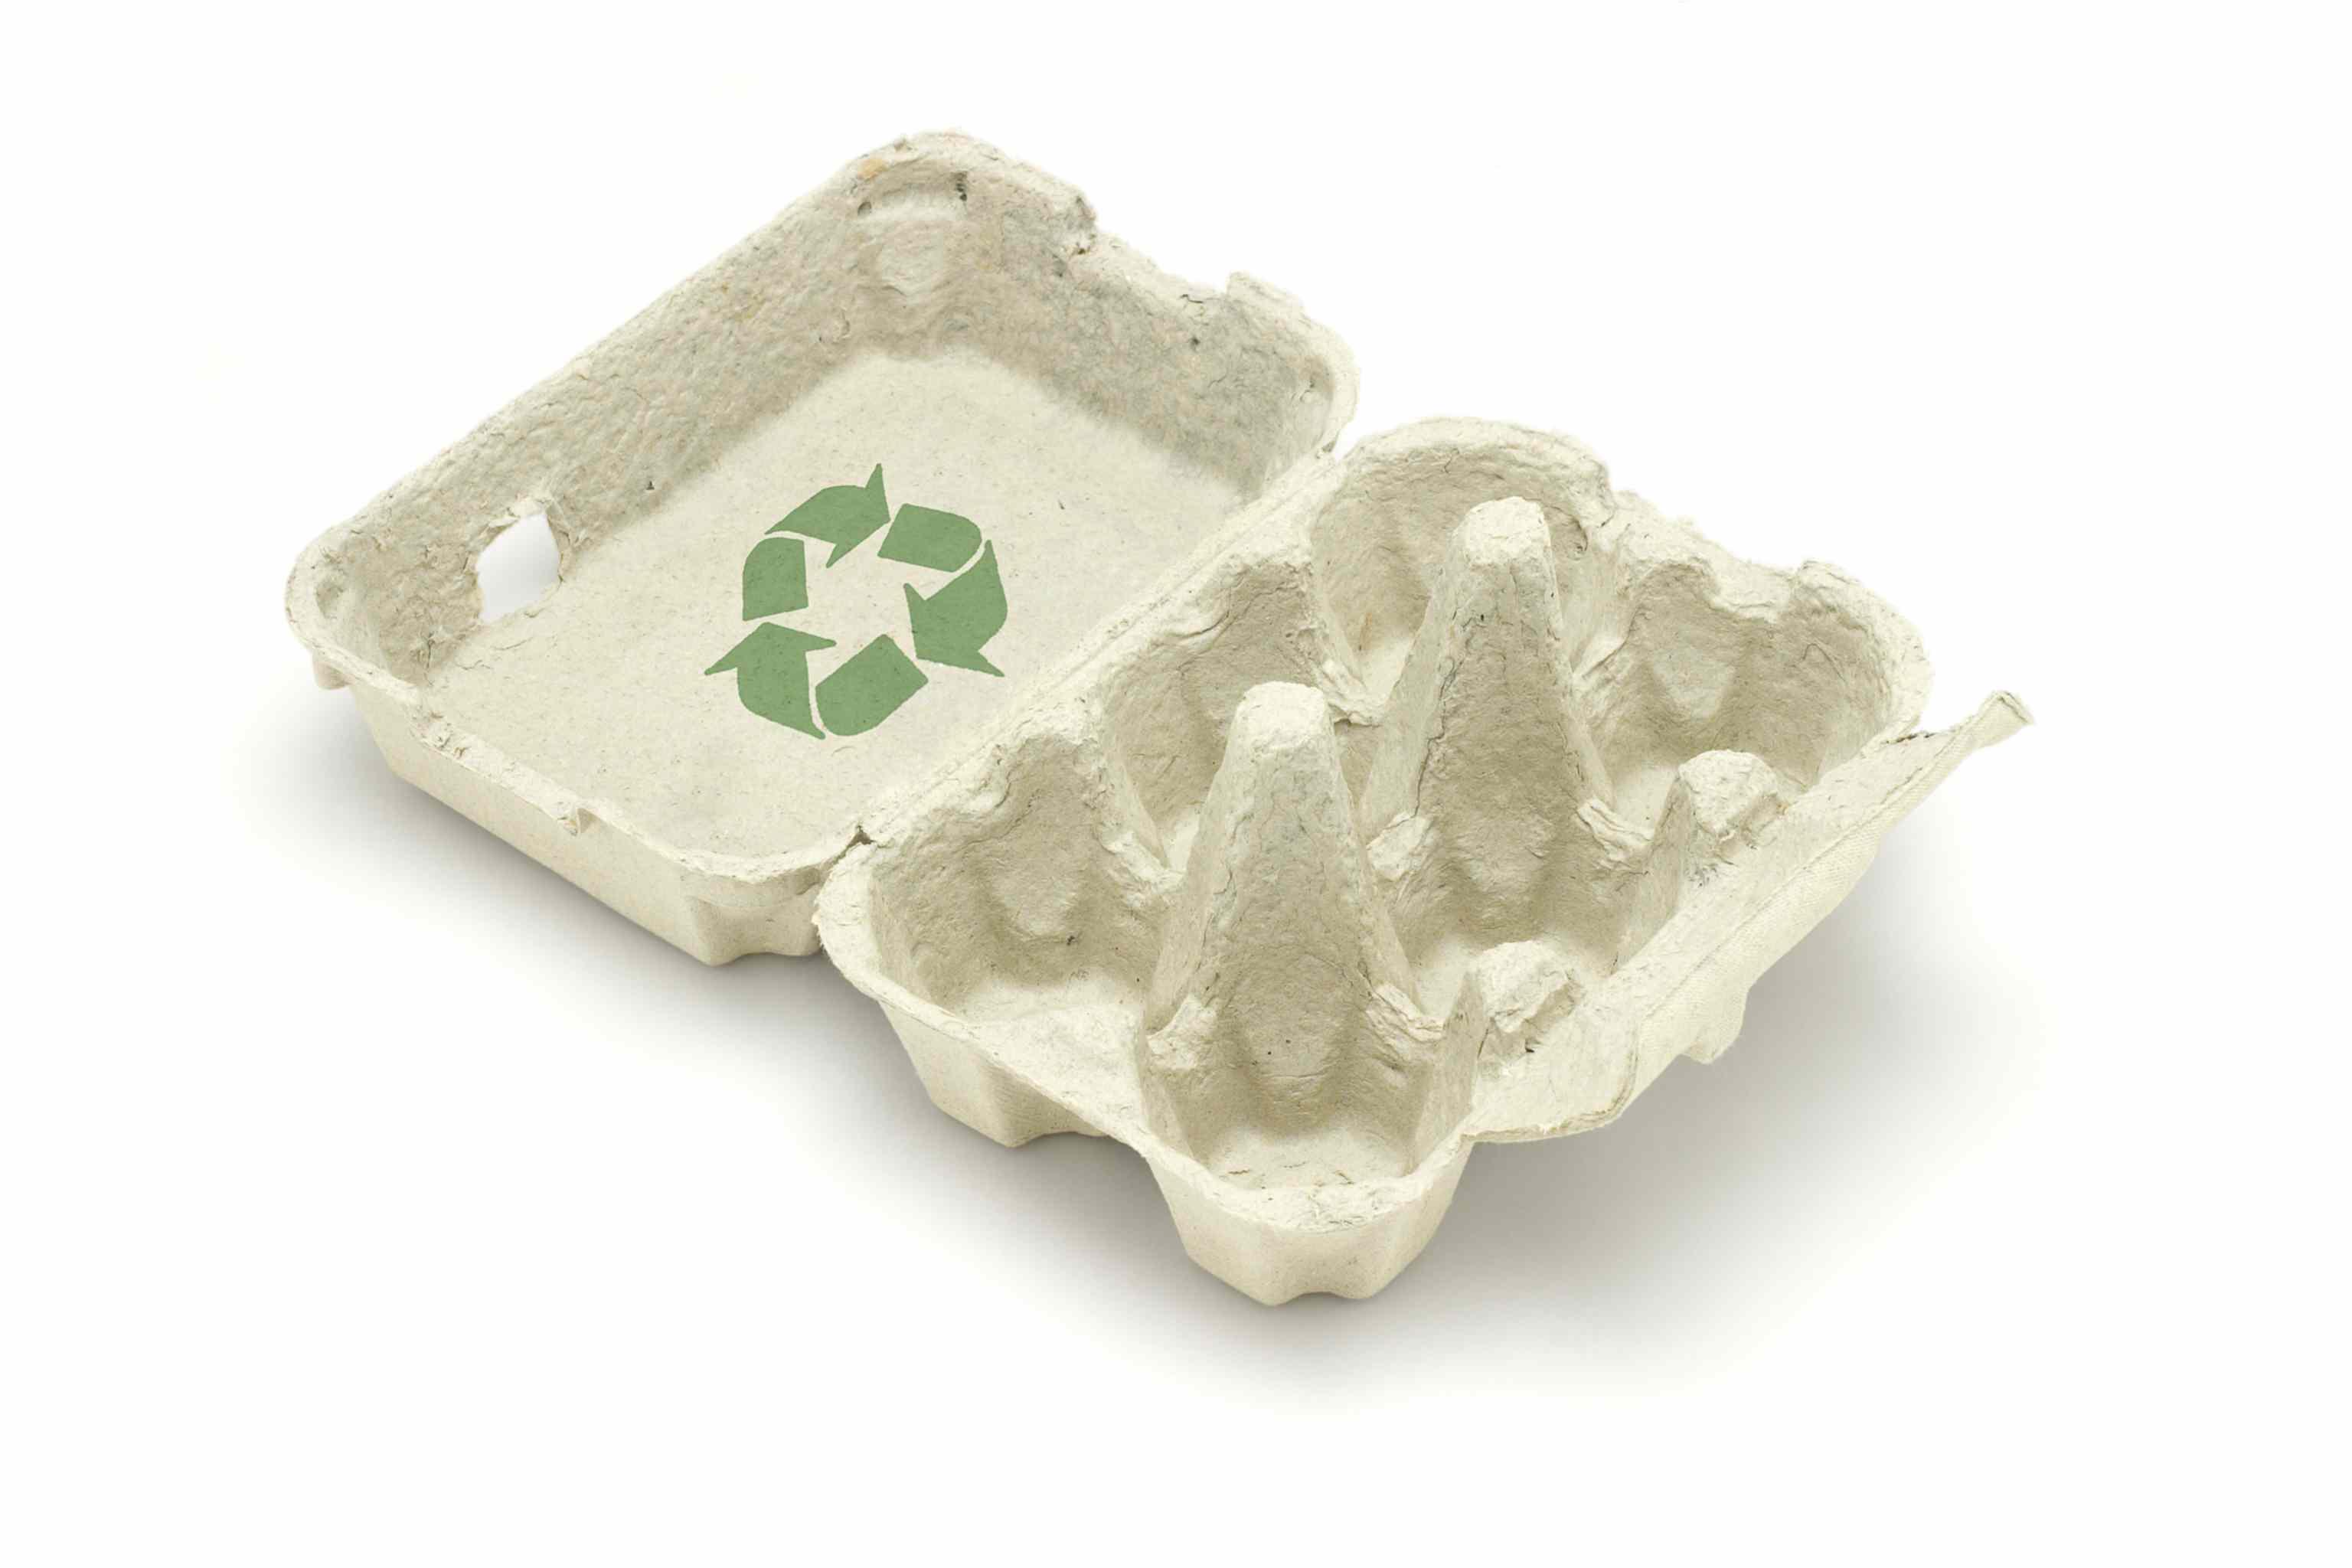 Recycle symbol on egg carton